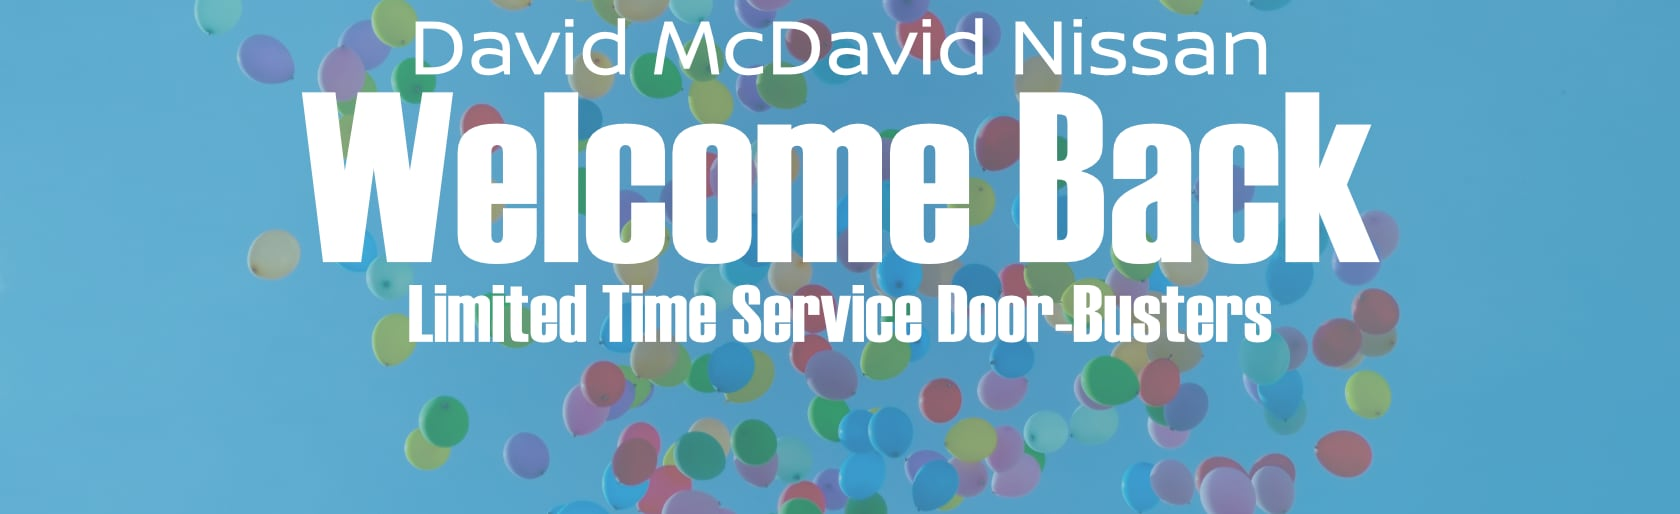 Welcome Back Specials | David McDavid Nissan Service